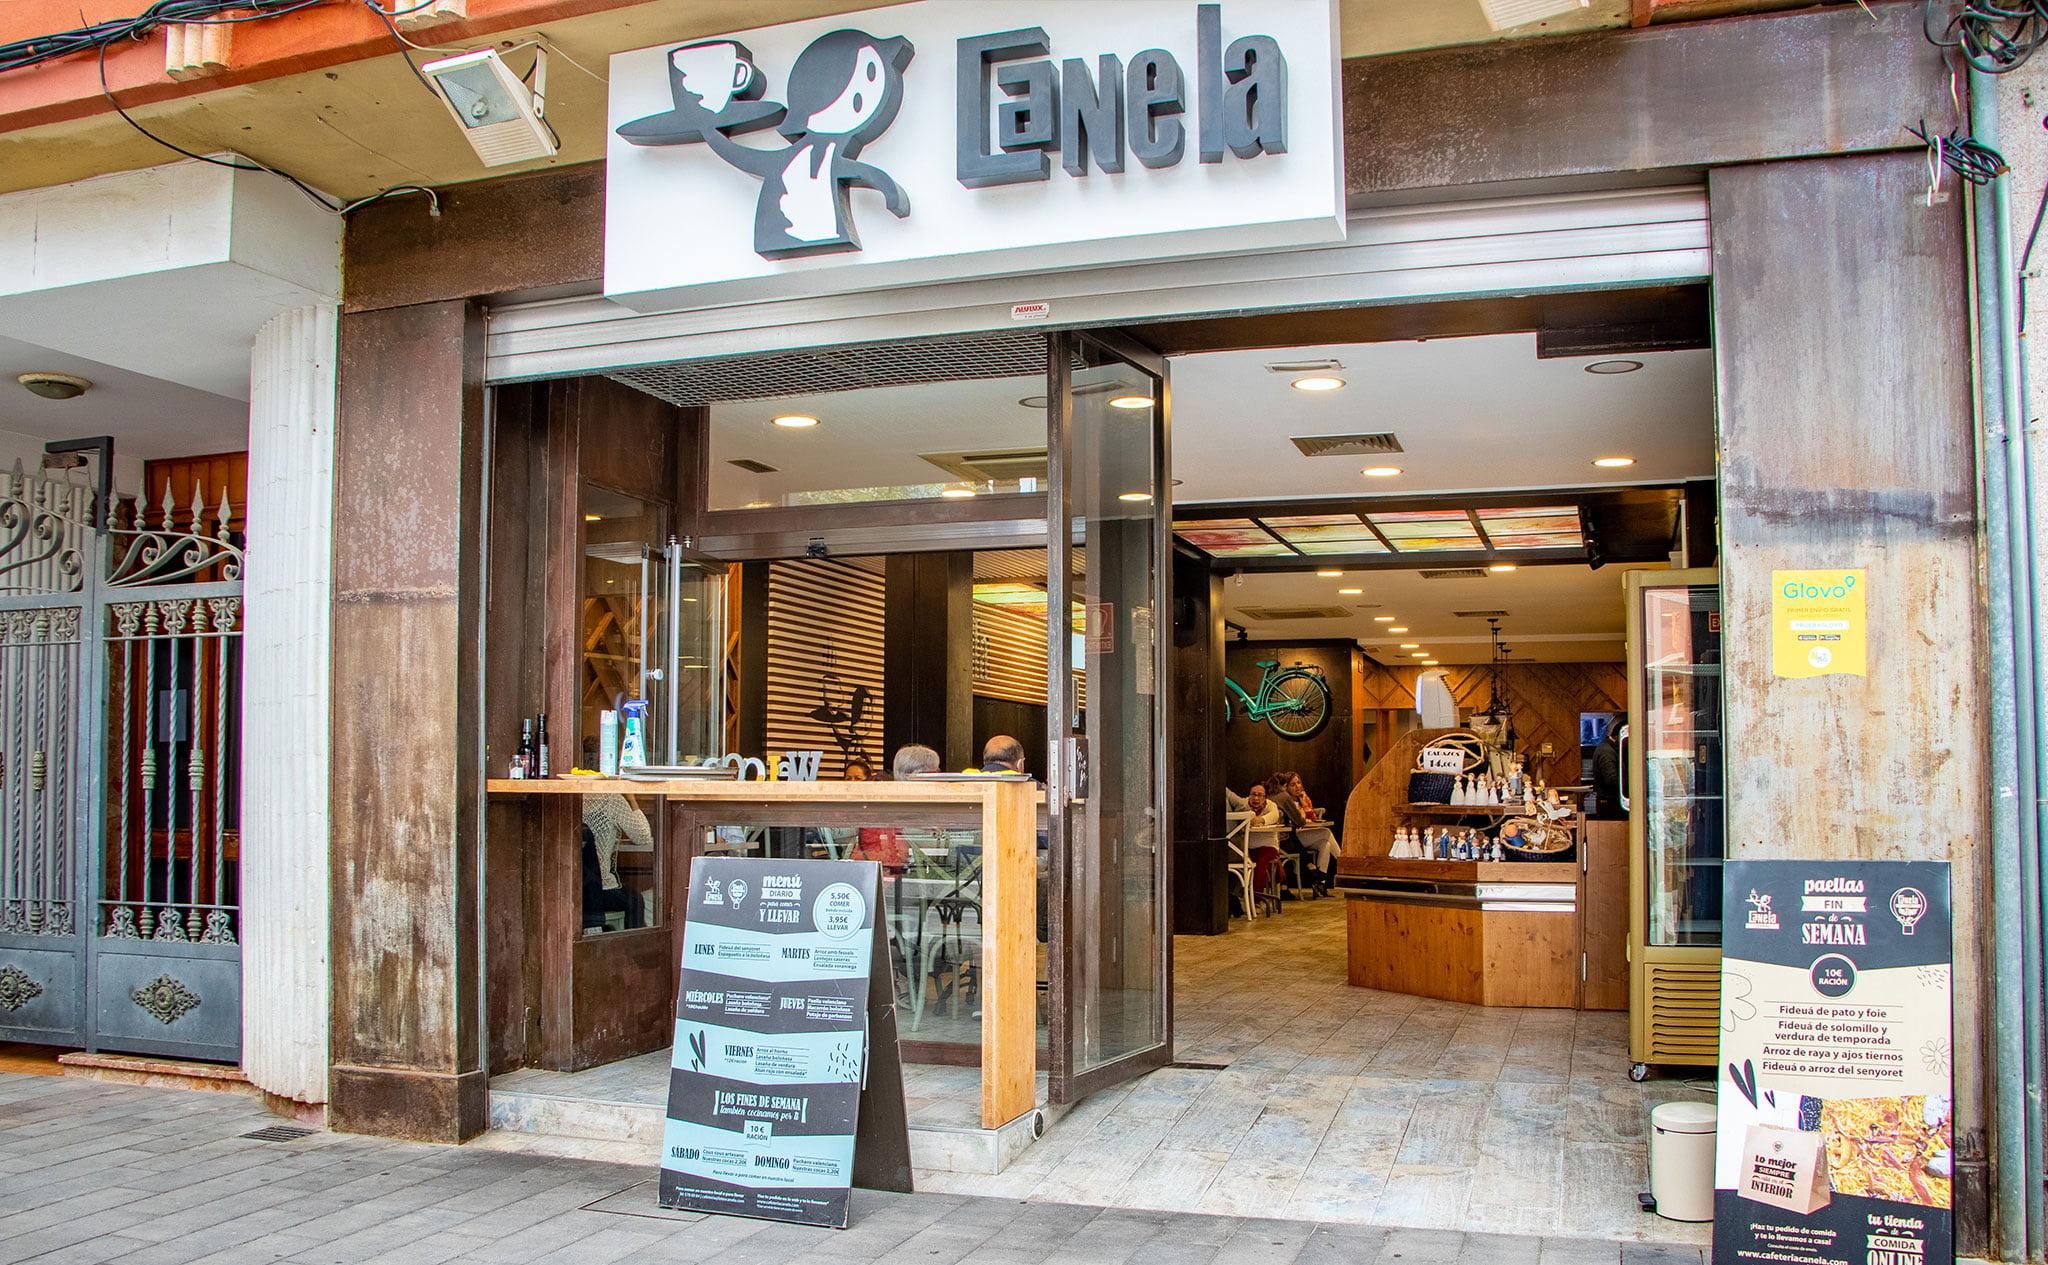 Entrada de Cafetería Canela